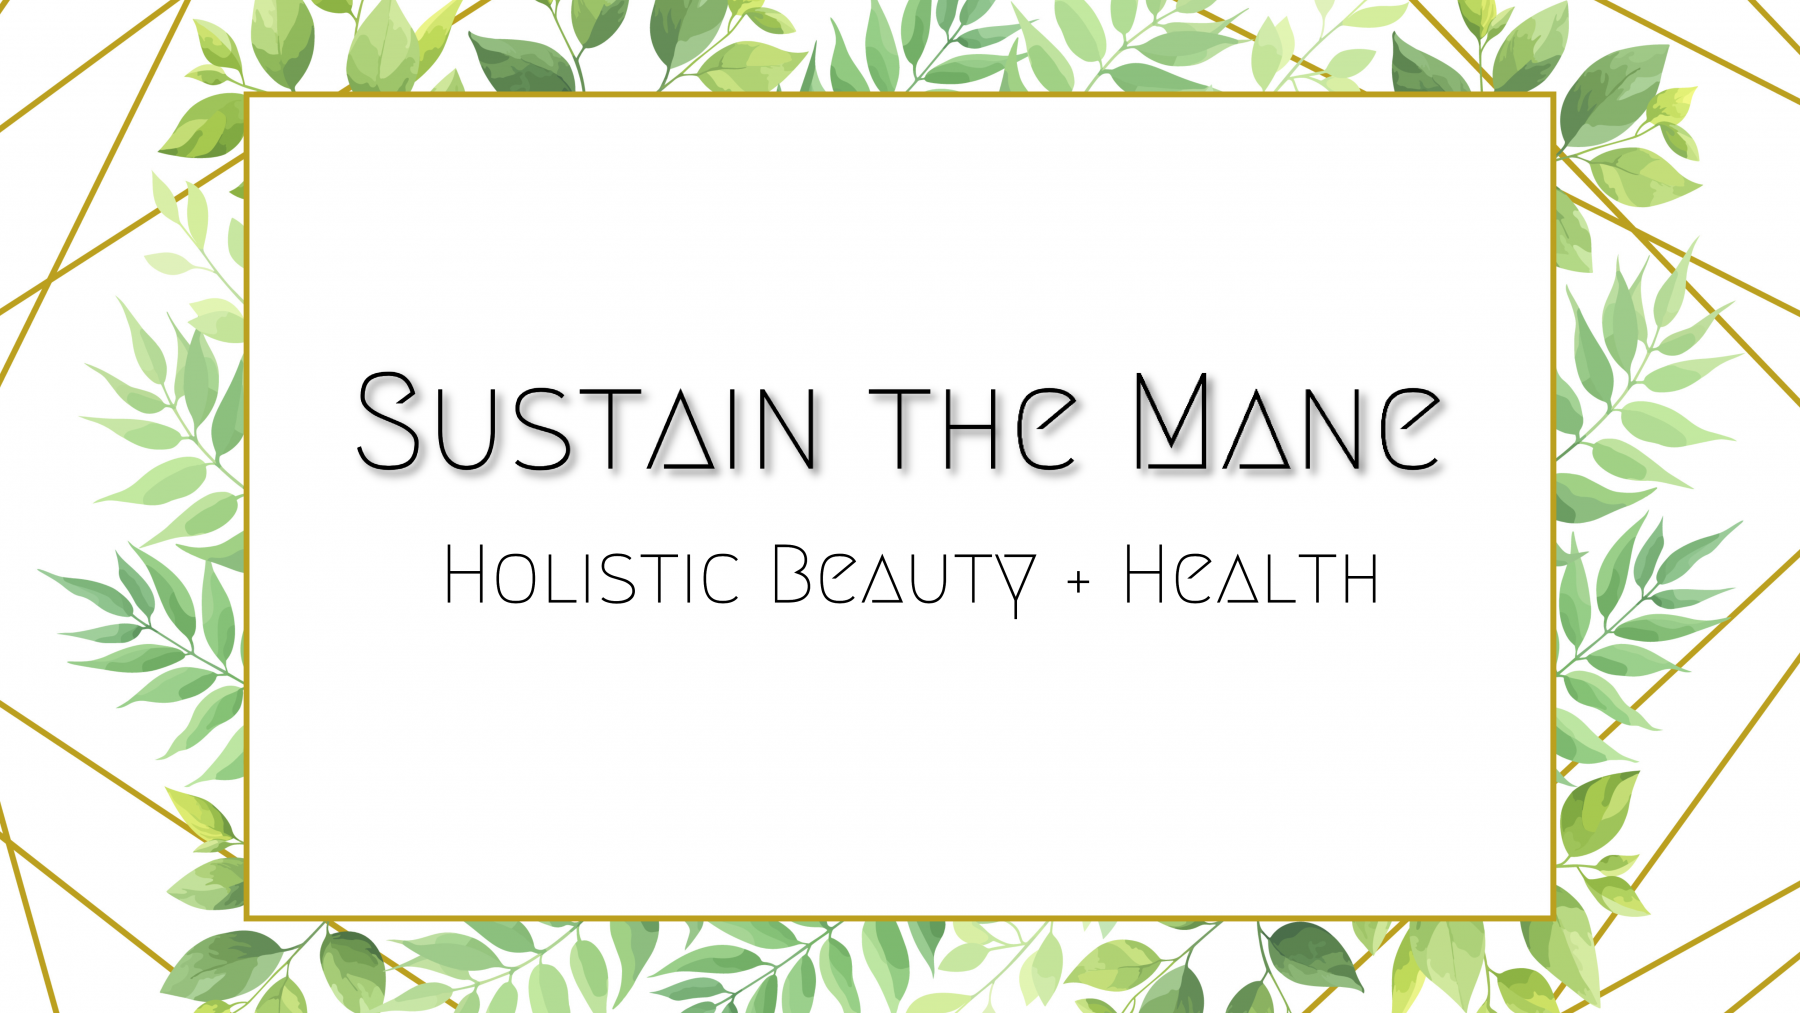 Sustain the Mane